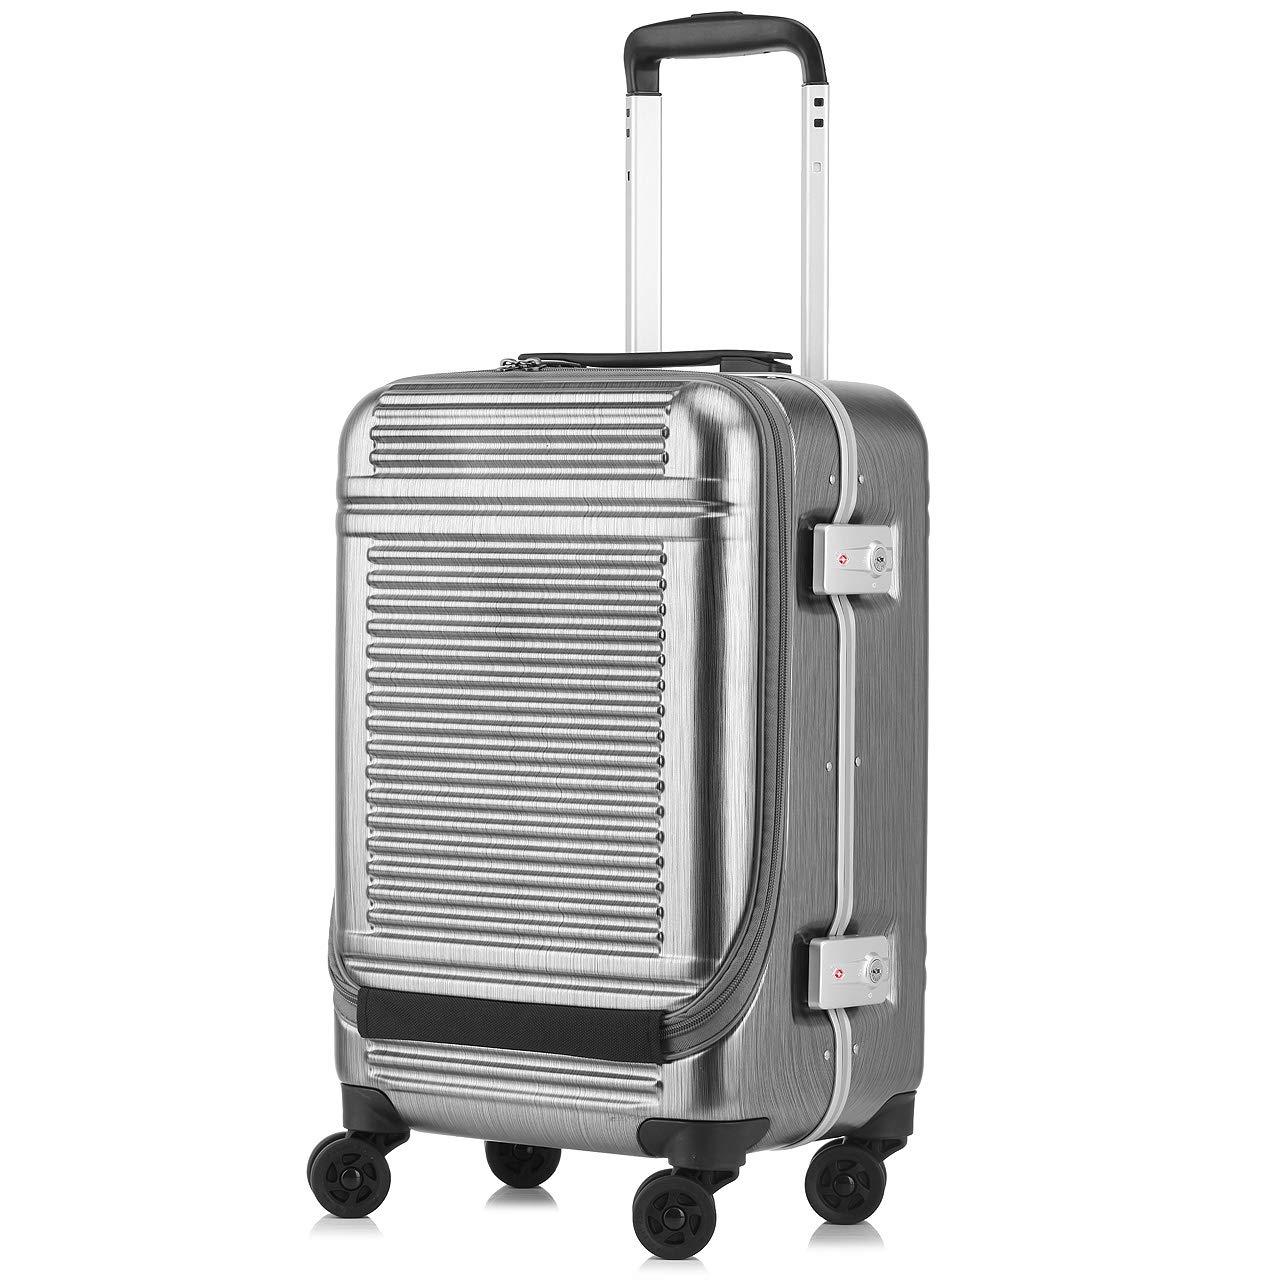 [SUNCO(サンコー)] スーツケース WORLD STAR W(ワールドスターW) 30L 48cm 3.8kg WSW1-SF  ヘアラインシルバー B07KY8TWP2